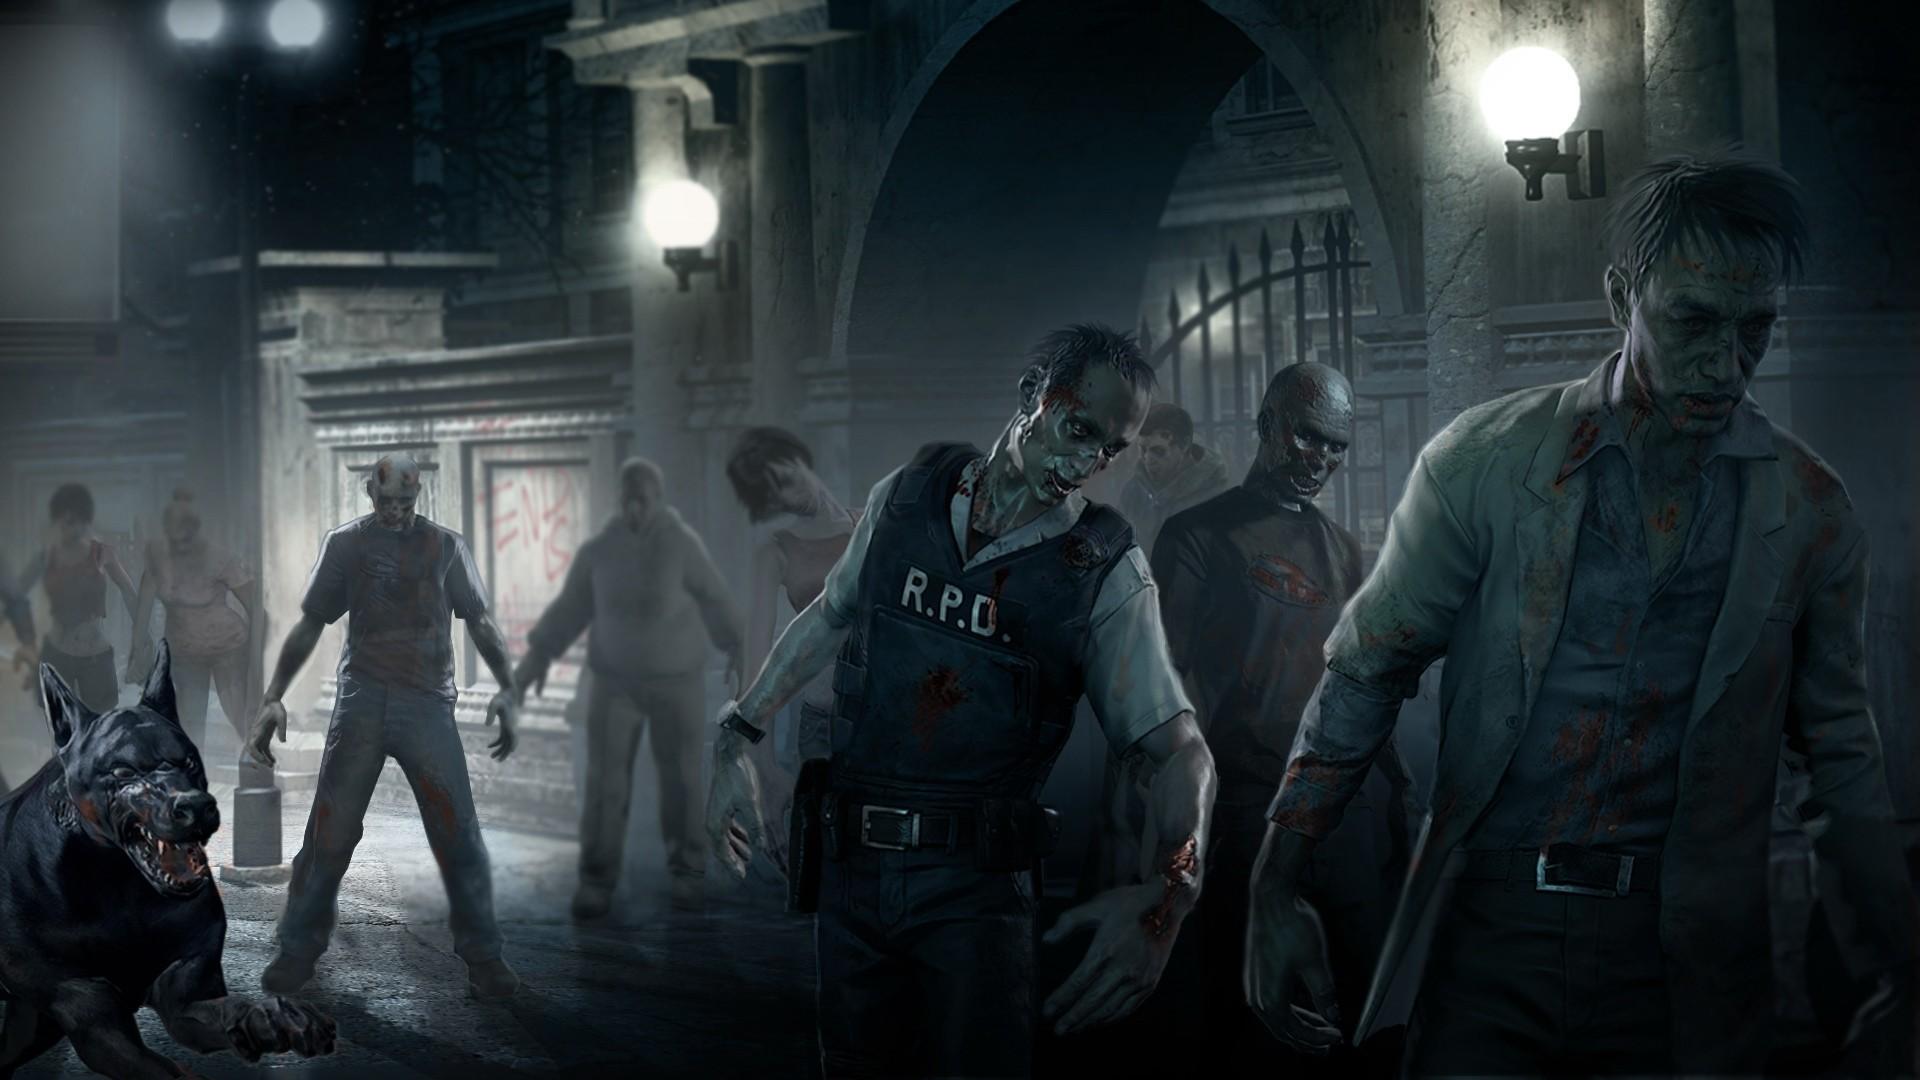 Zombie Apocalypse Wallpaper Hd 76 Images